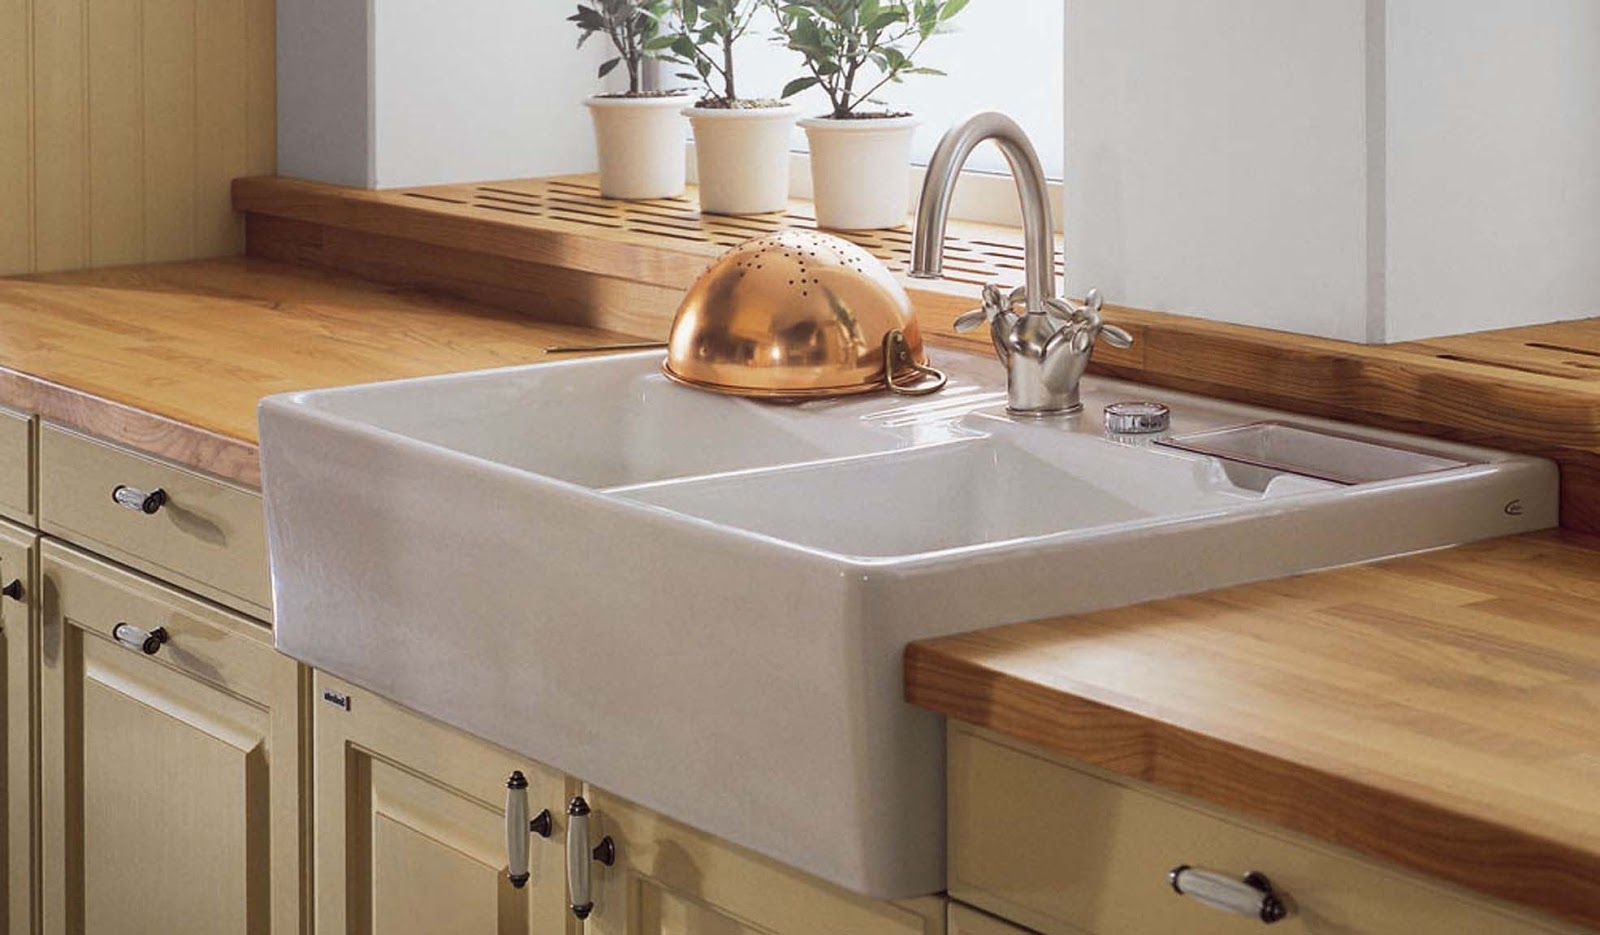 Como elegir el fregadero ideal para mi cocina diariodeco - Fregaderos de granito para cocina ...